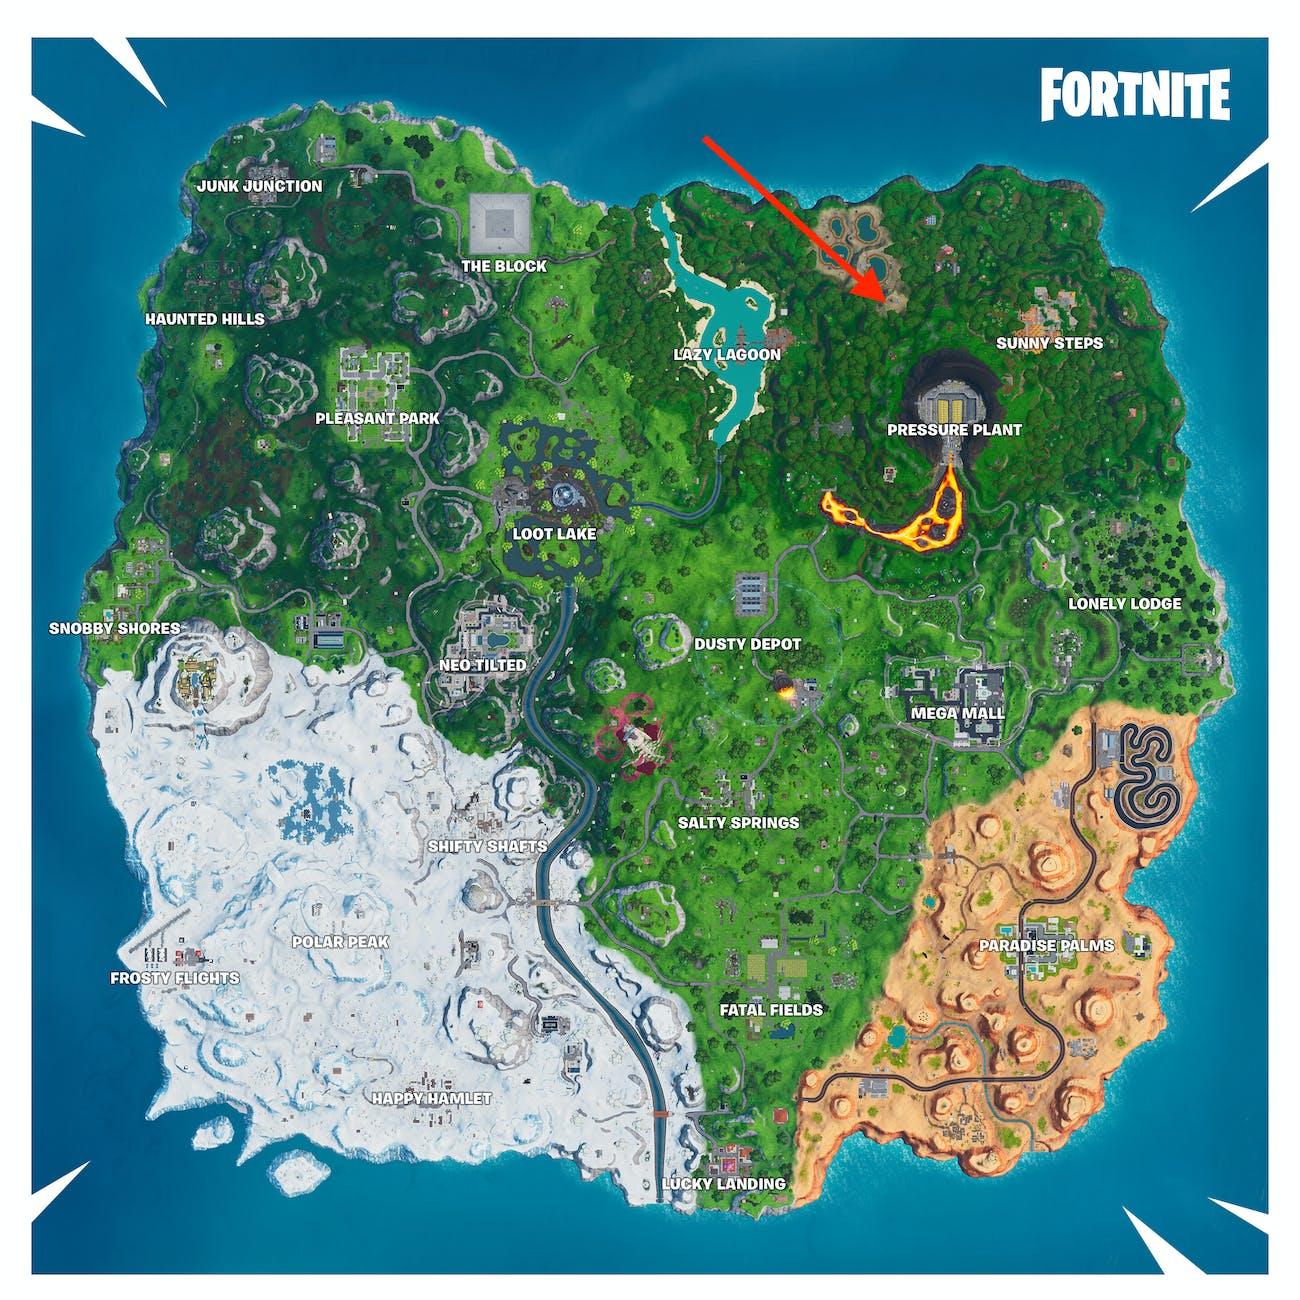 fortnite season 10 week 8 loading screen map